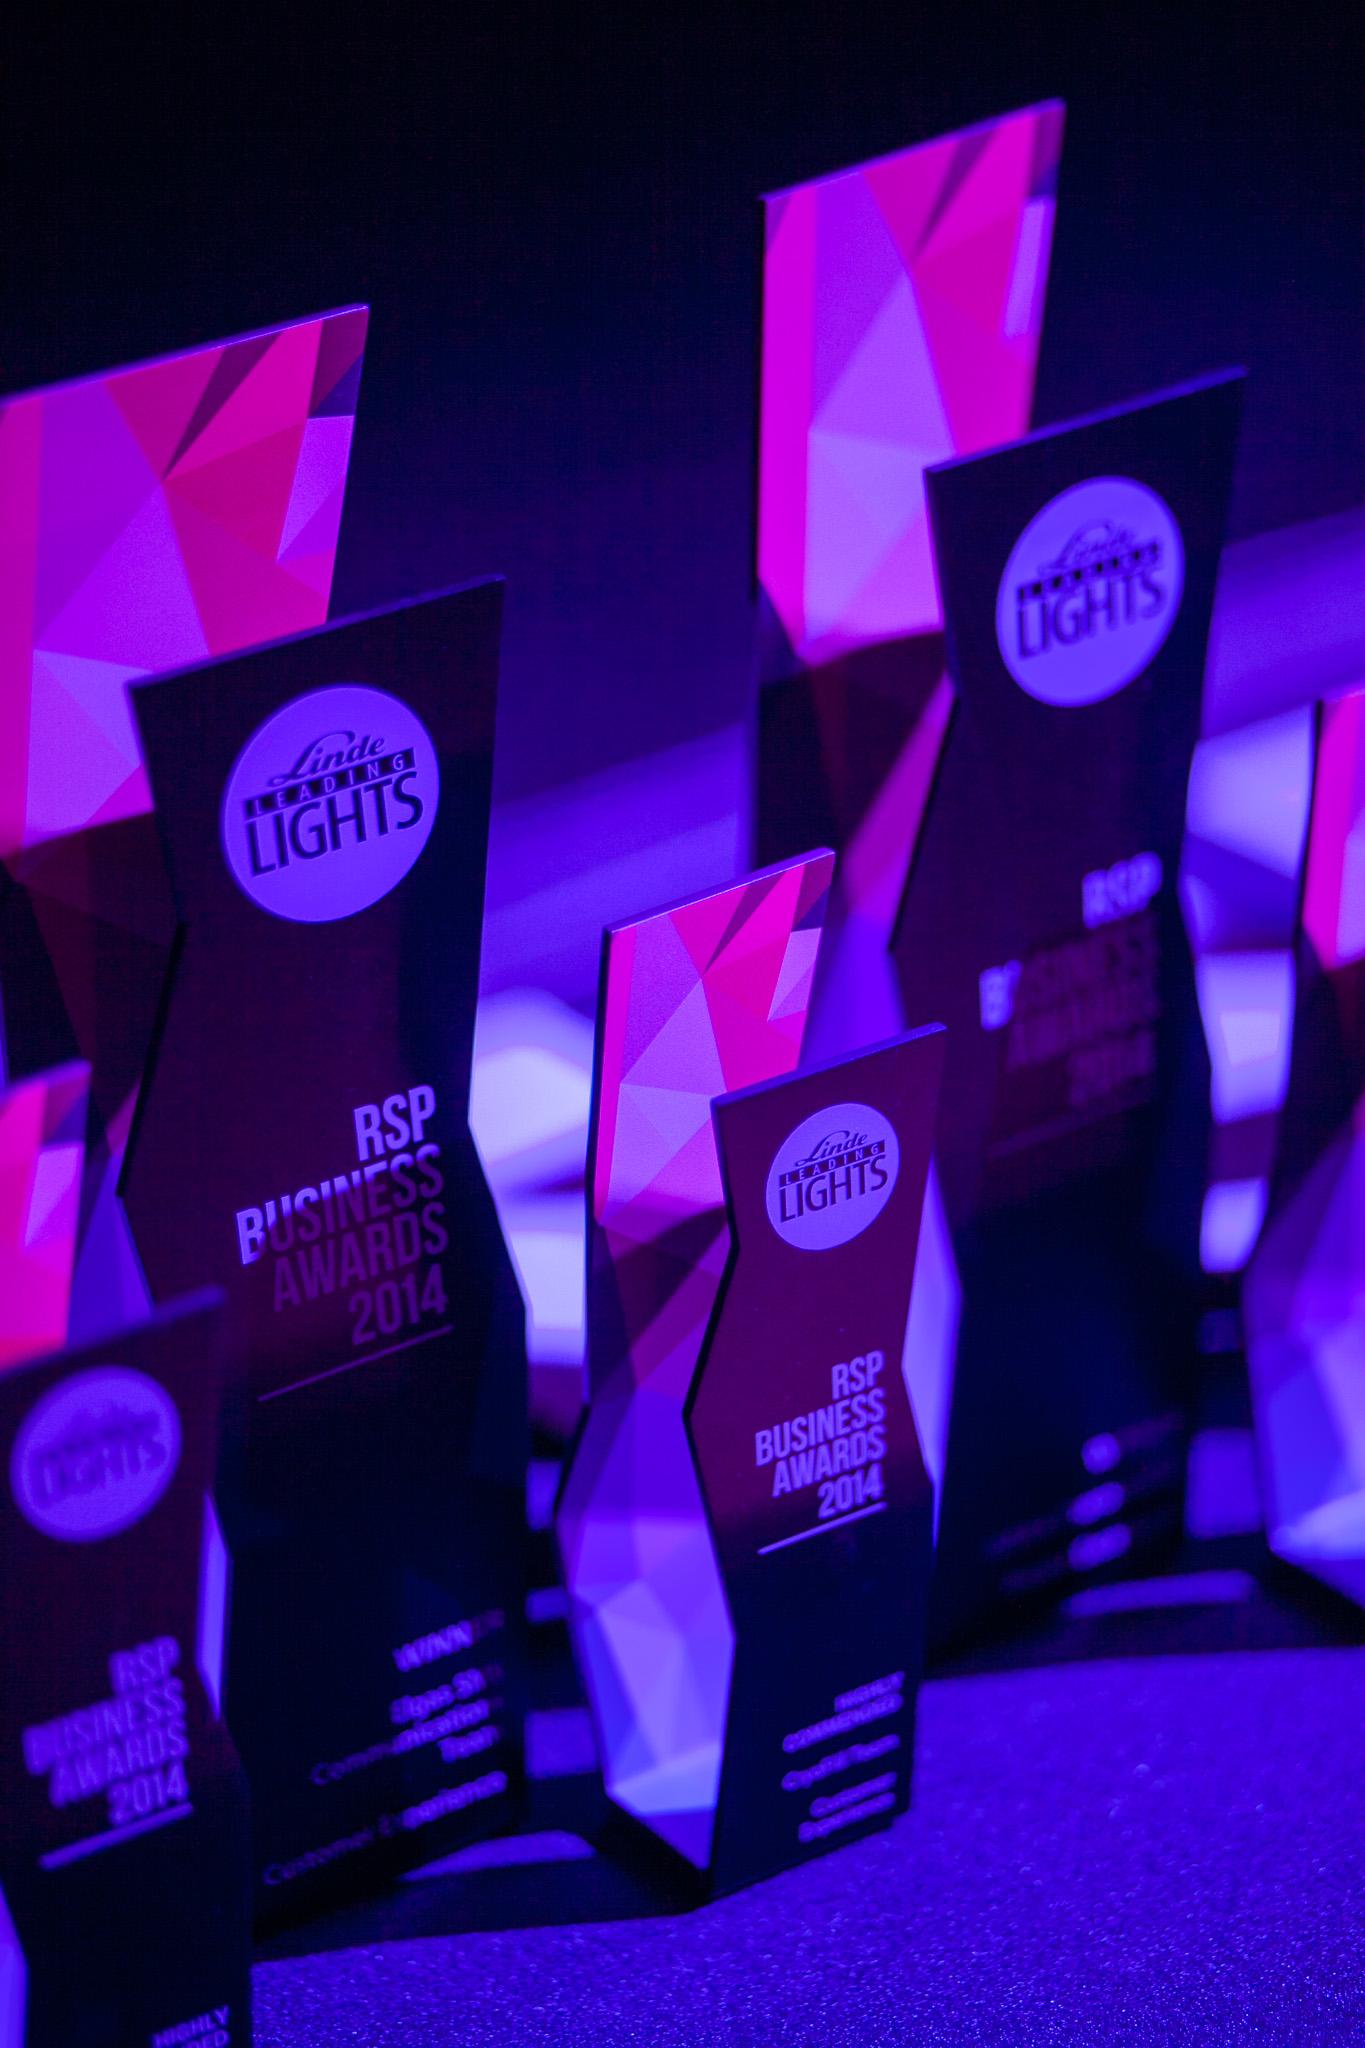 custom business awards not crystal